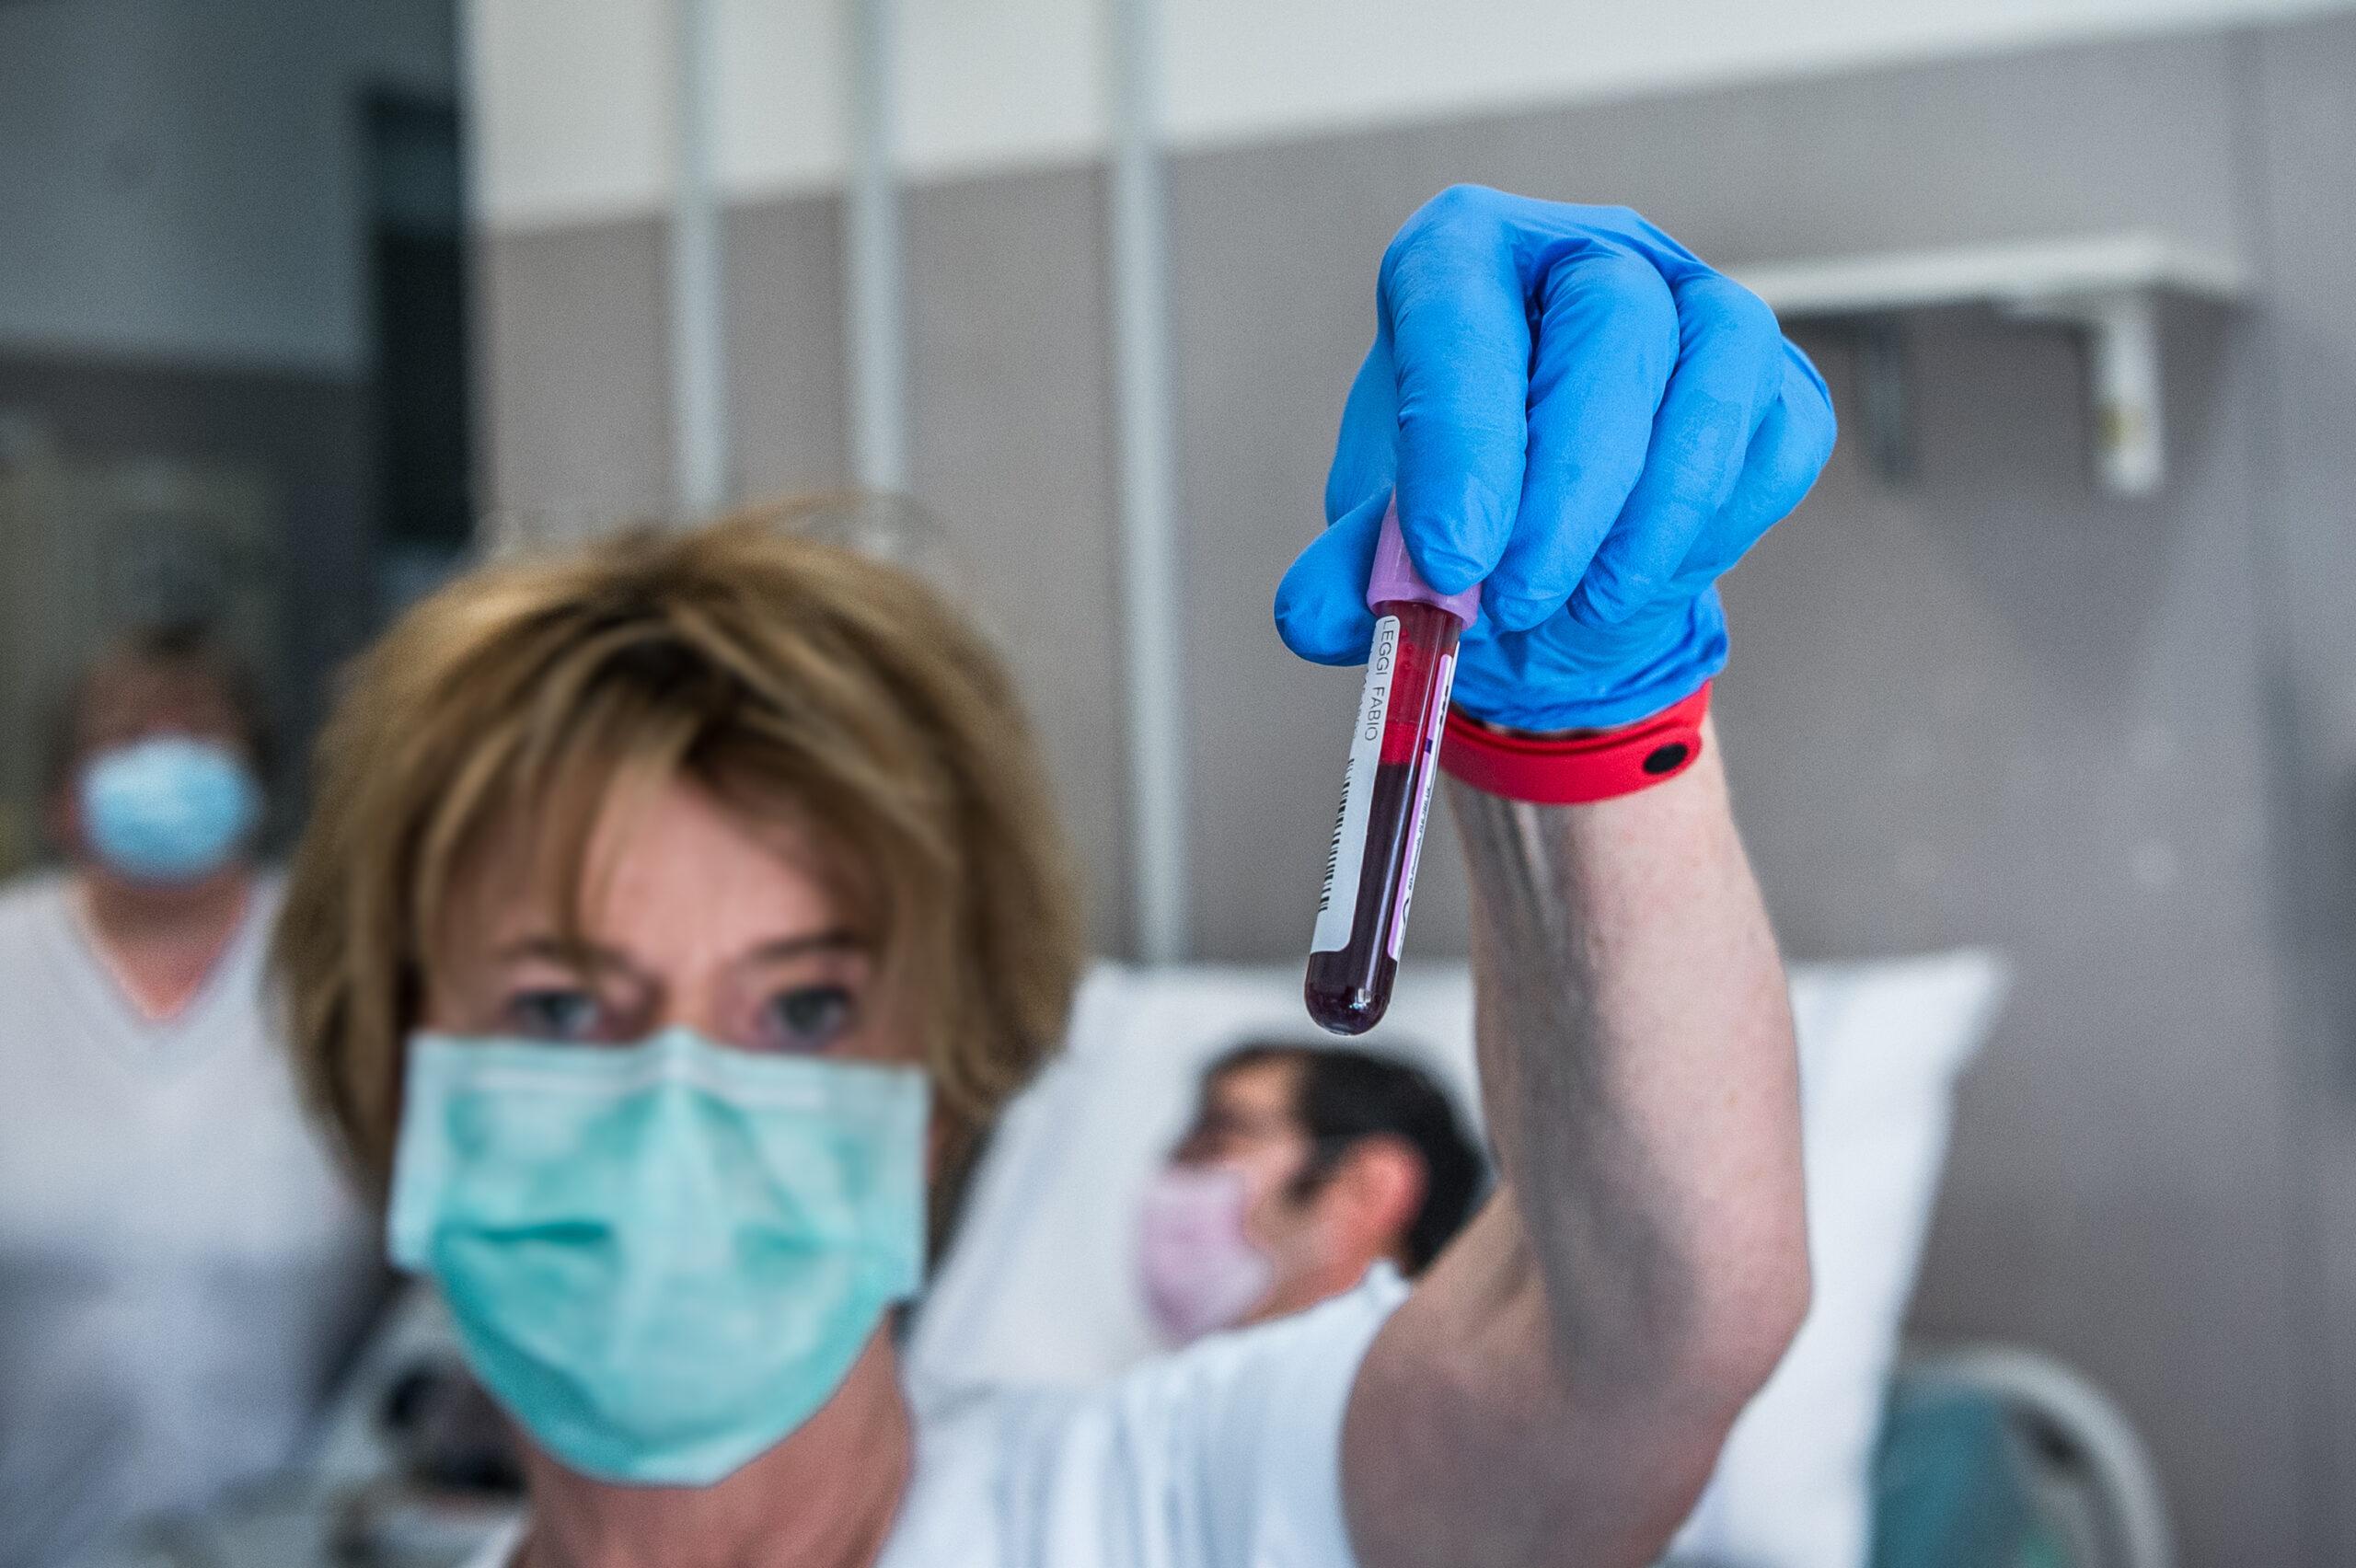 Cos'è successo alla cura del plasma iperimmune